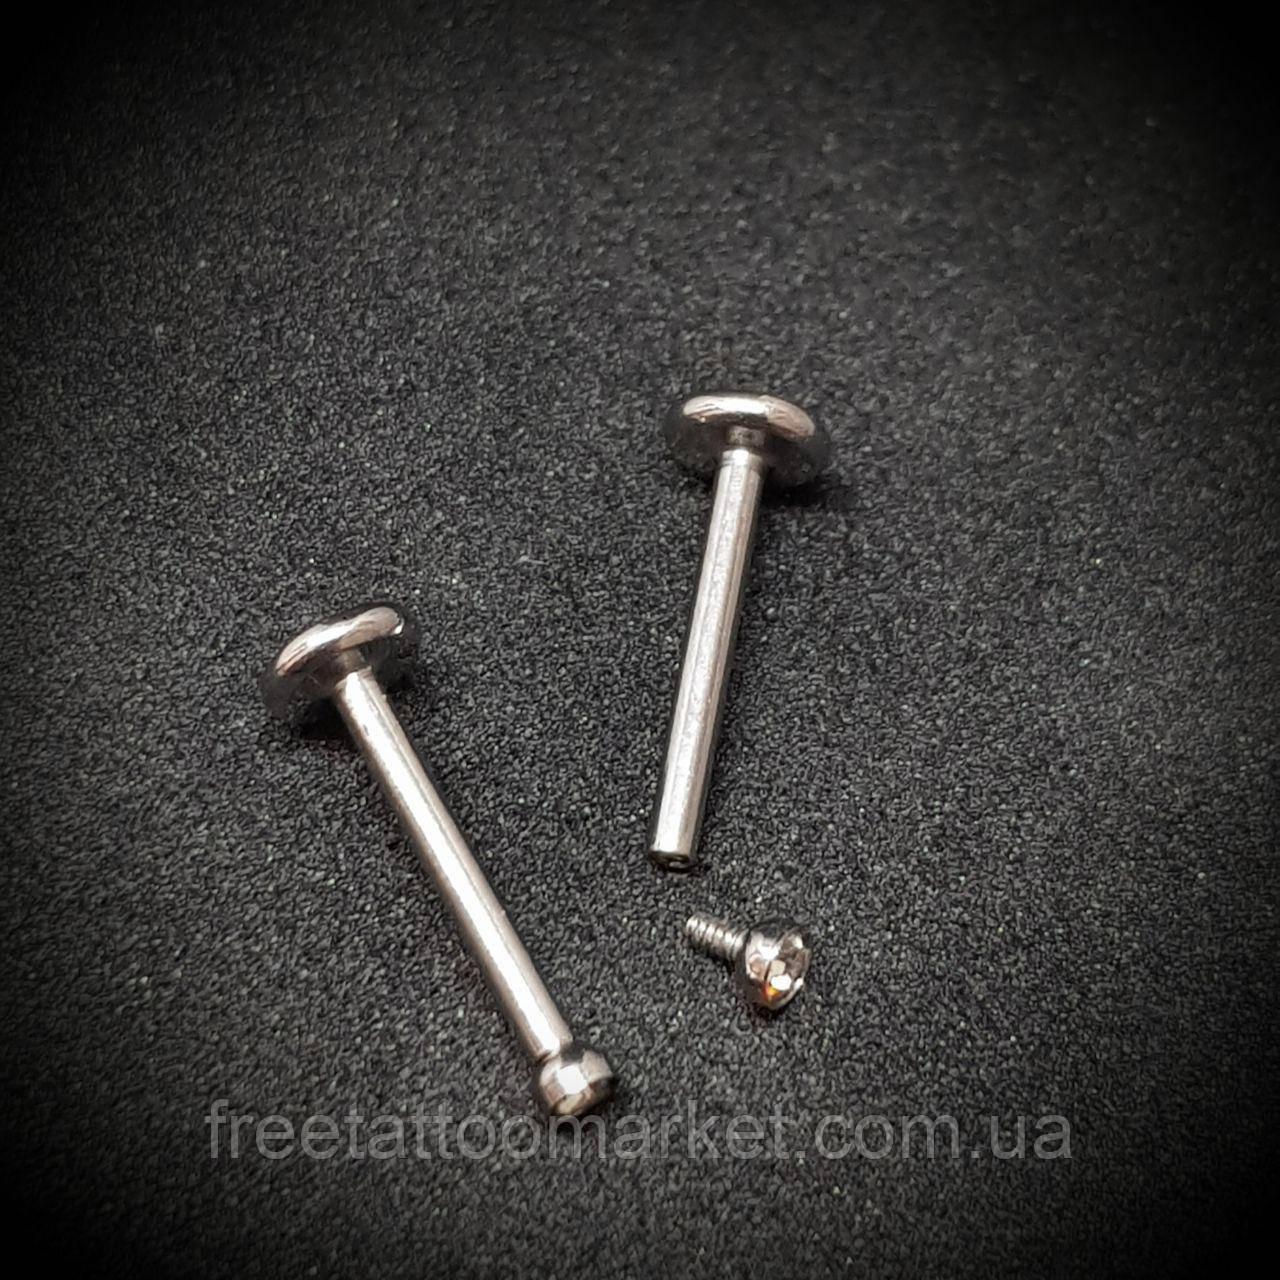 Лабрет титановый с закручивающимся мини фианитом 1.2 х 10 х 2мм (титан)